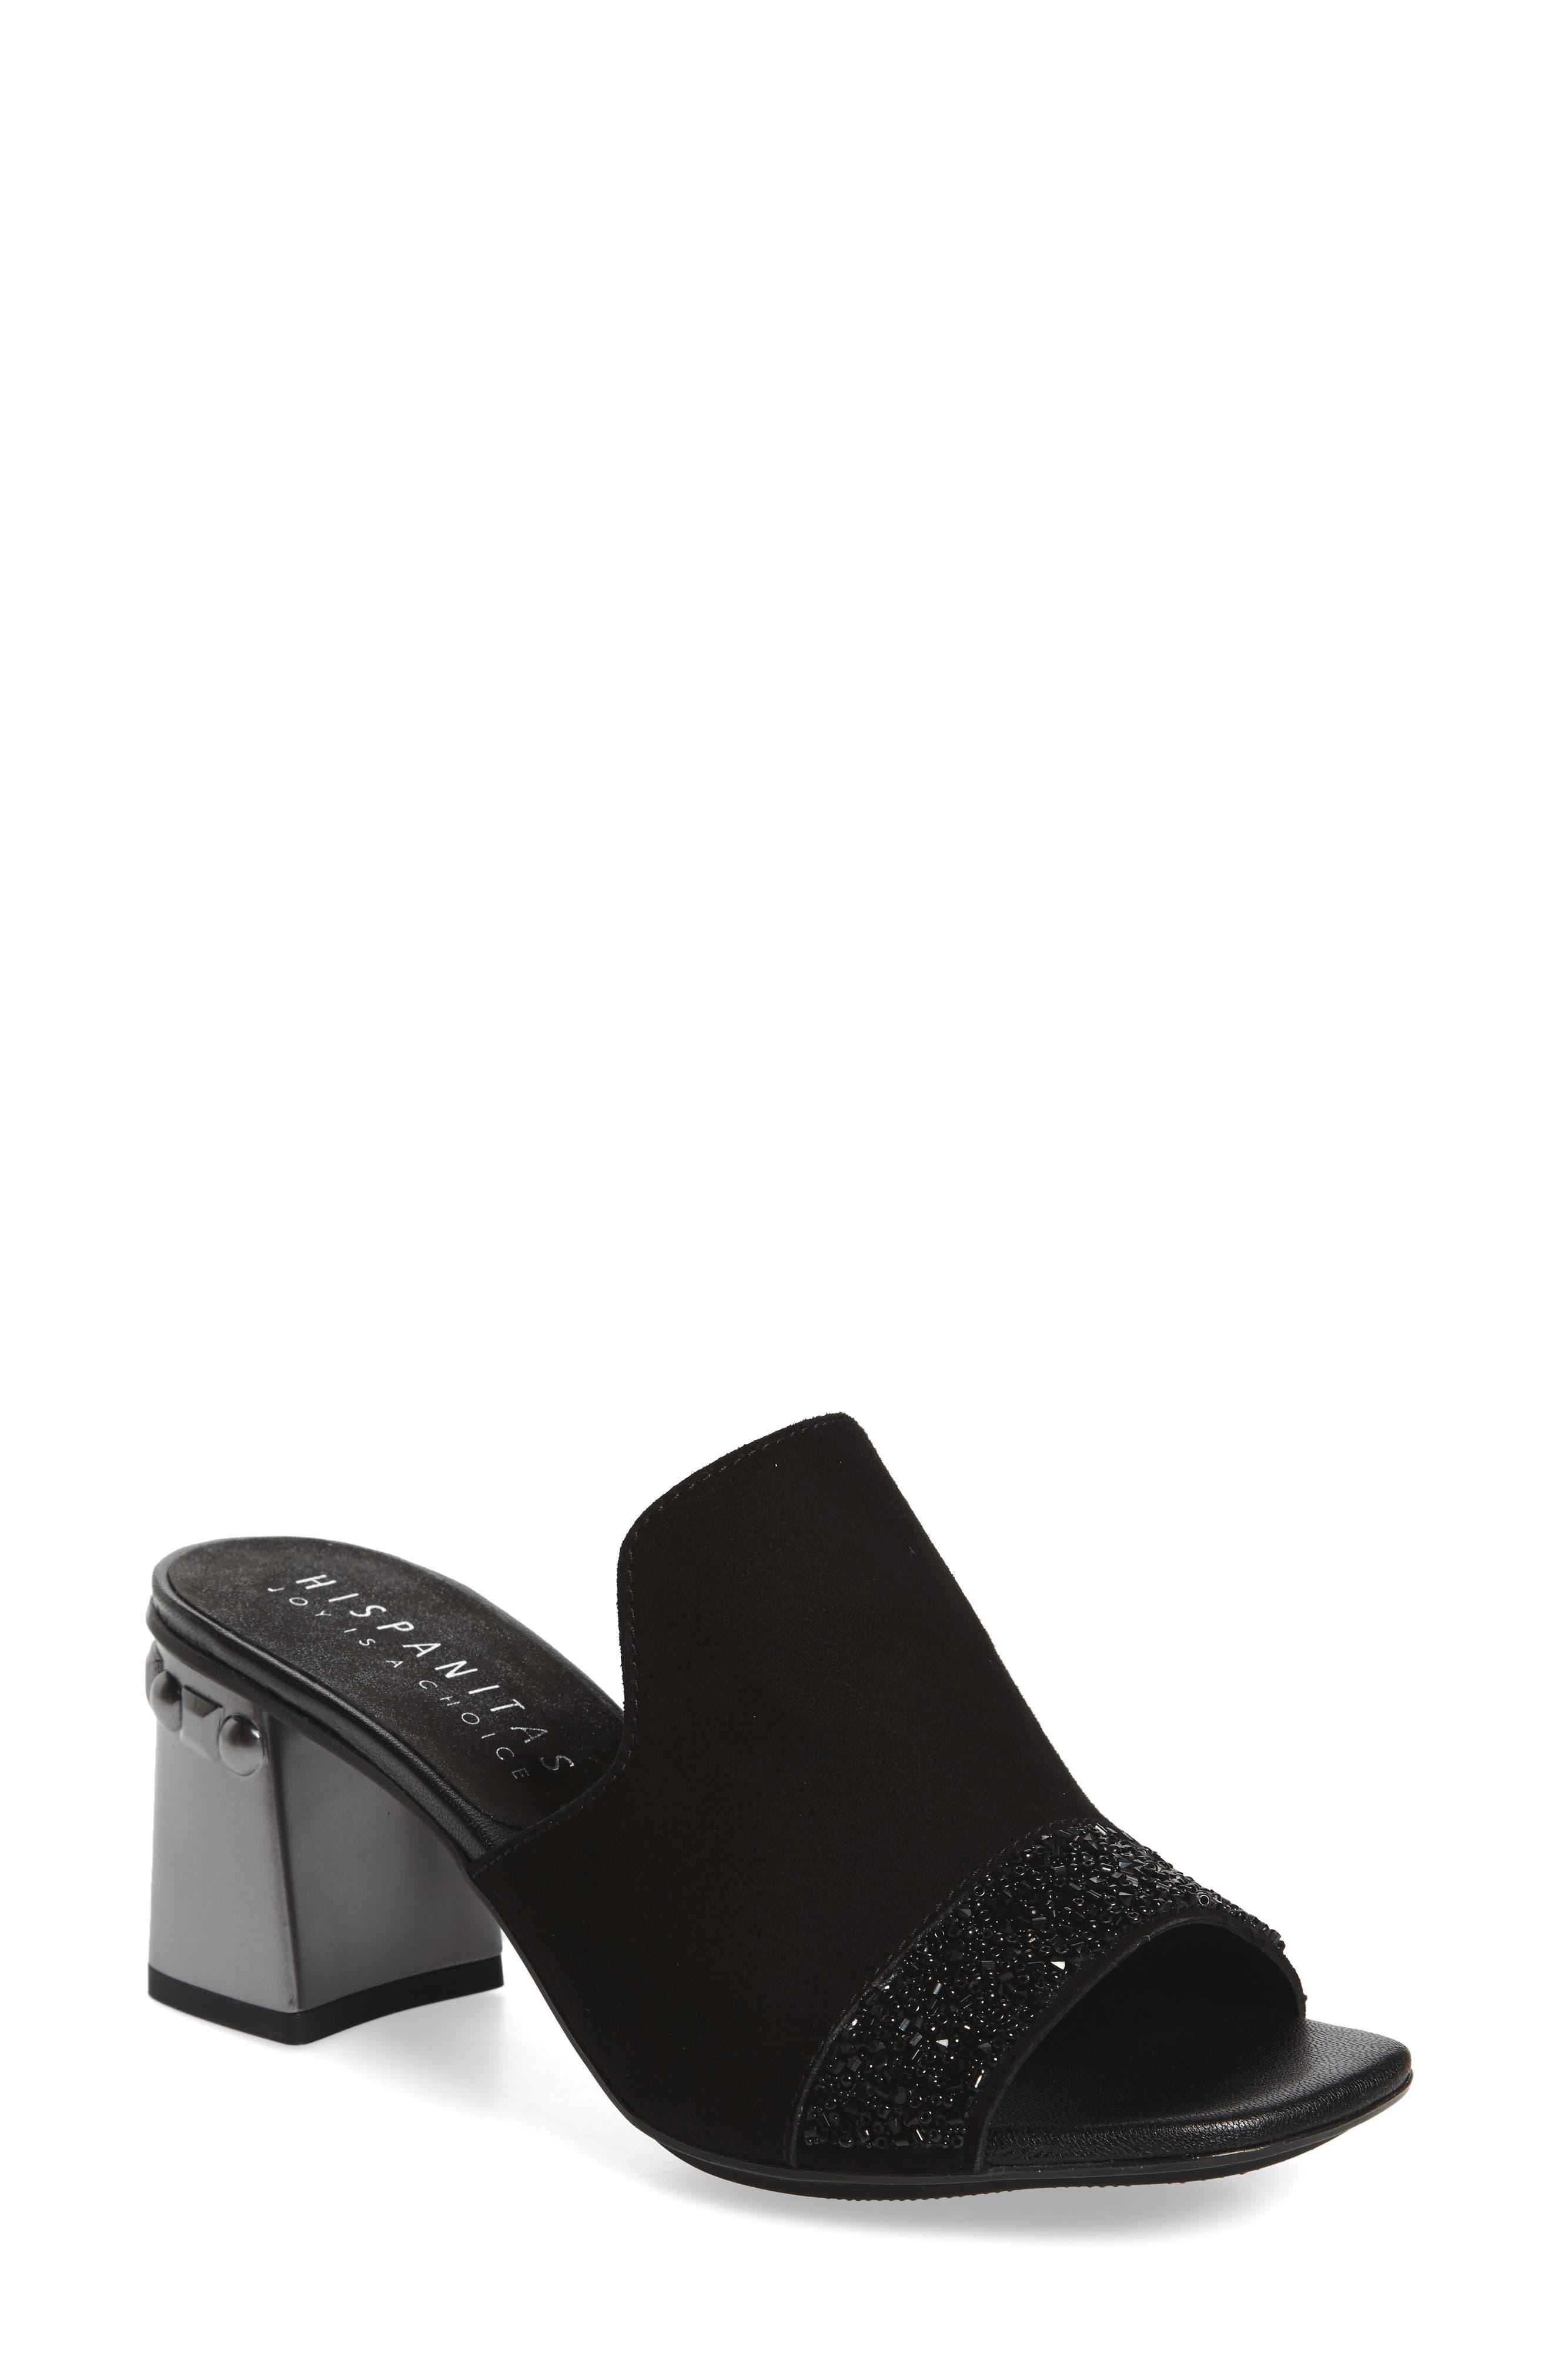 Stormie Slide Sandal,                         Main,                         color, 001